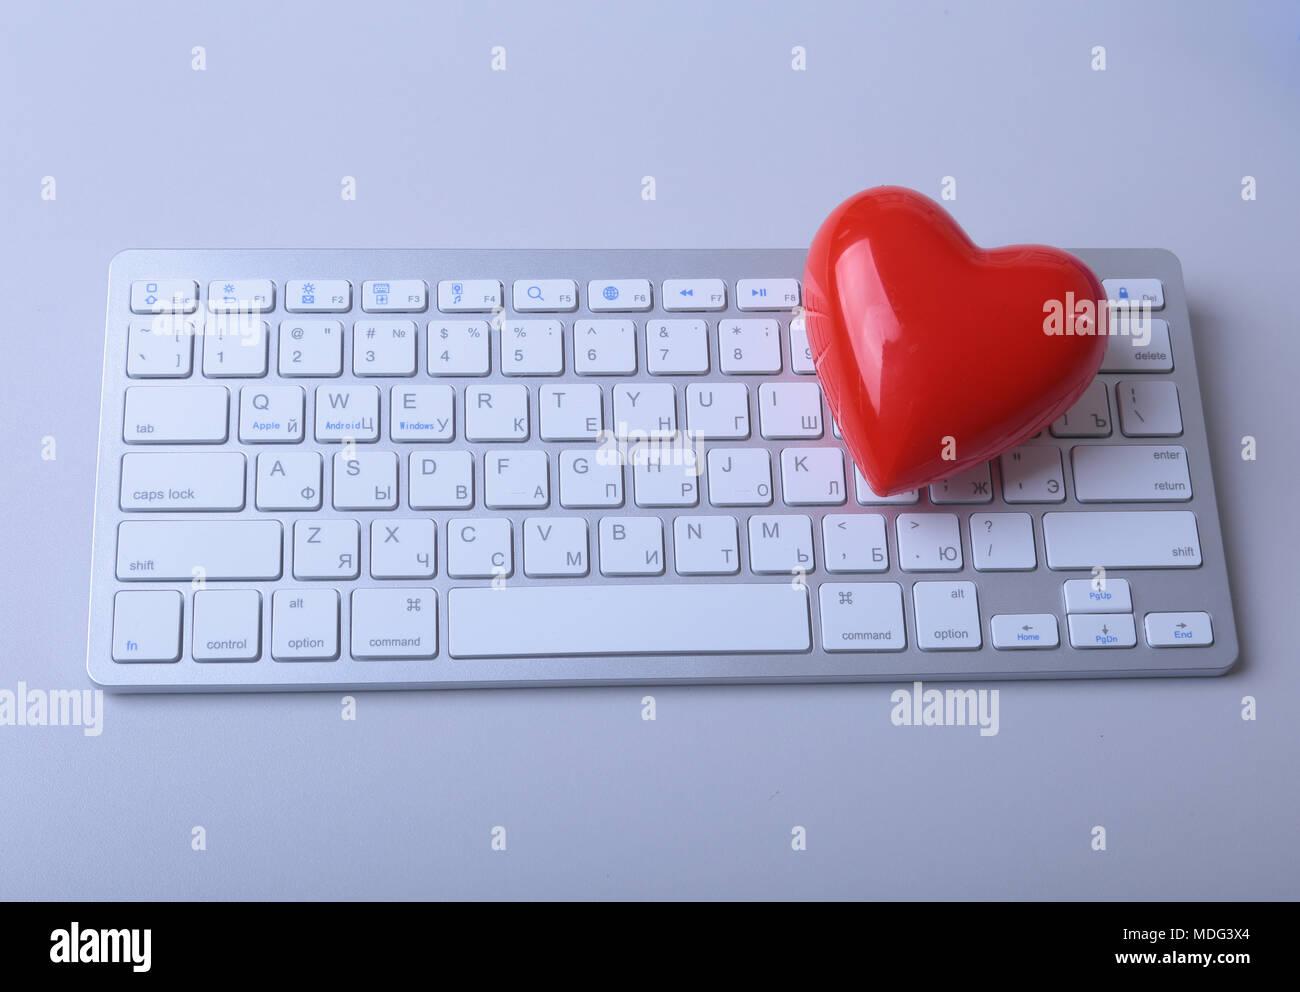 Opinione su Internet Dating